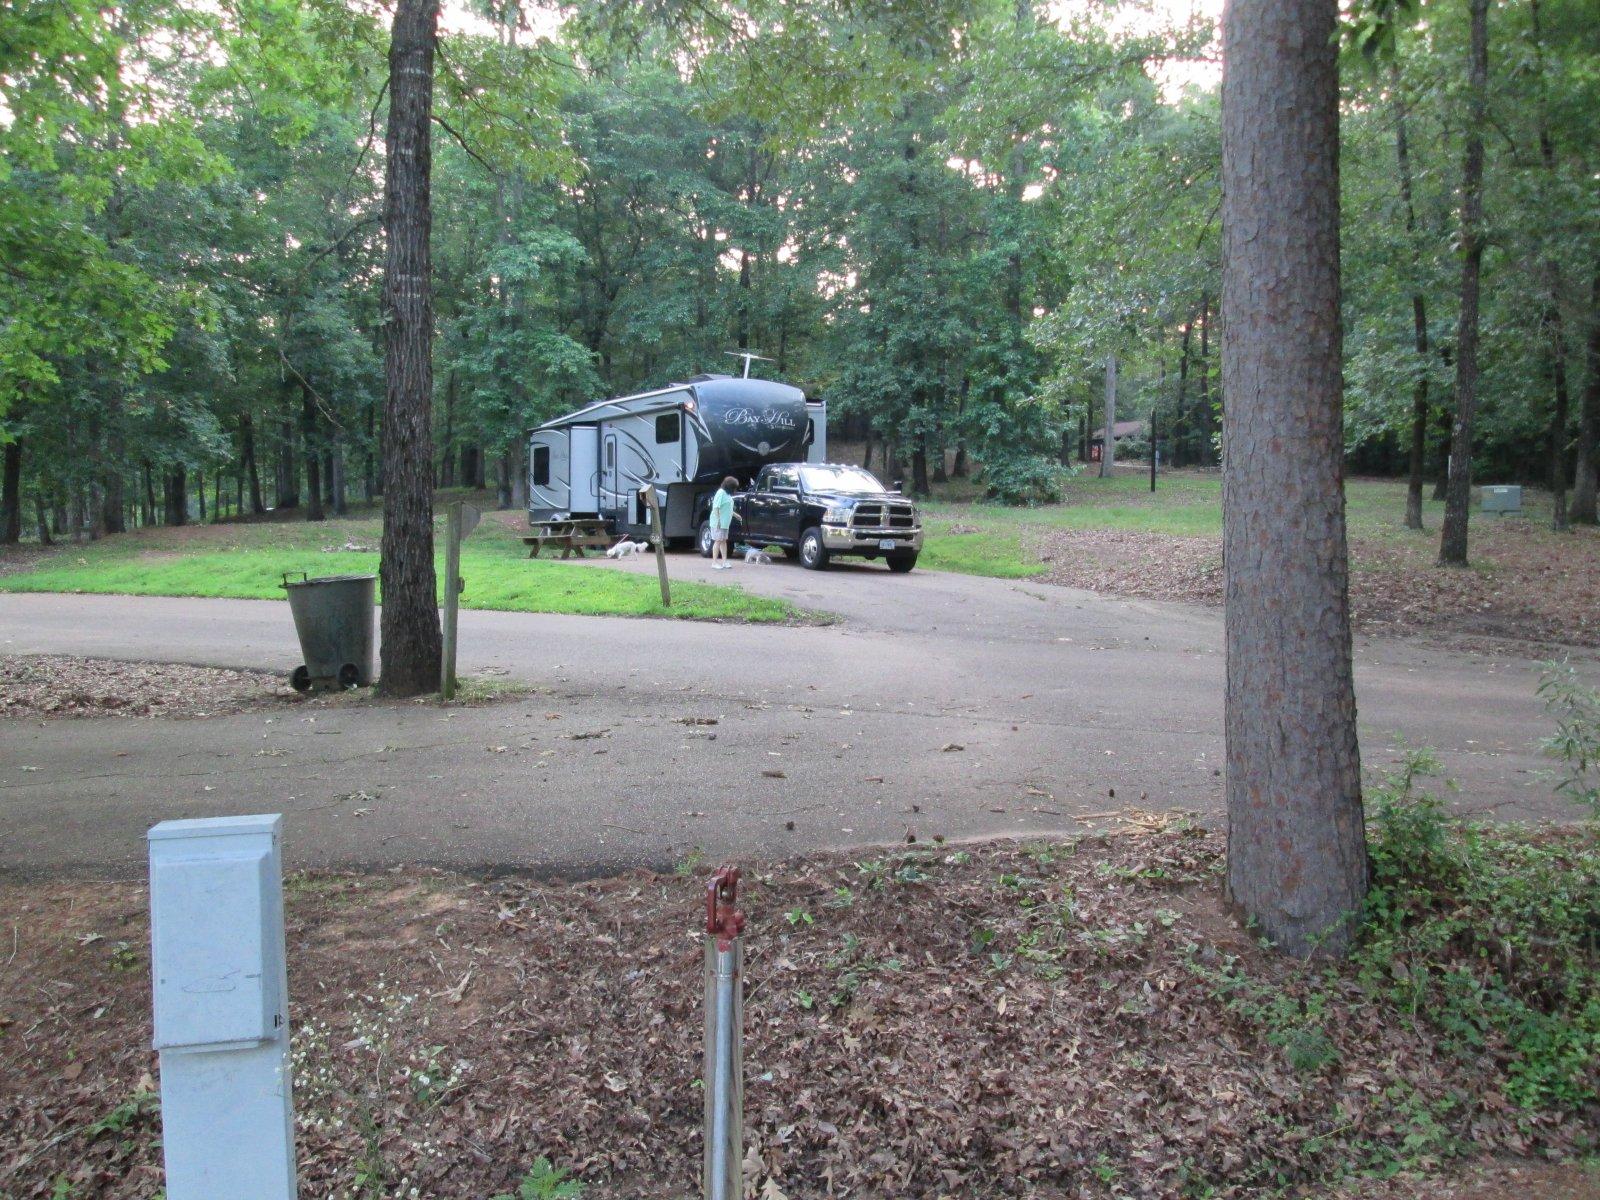 Click image for larger version  Name:Lincoln Parish Park 3 Louisiana.jpg Views:81 Size:510.7 KB ID:112260